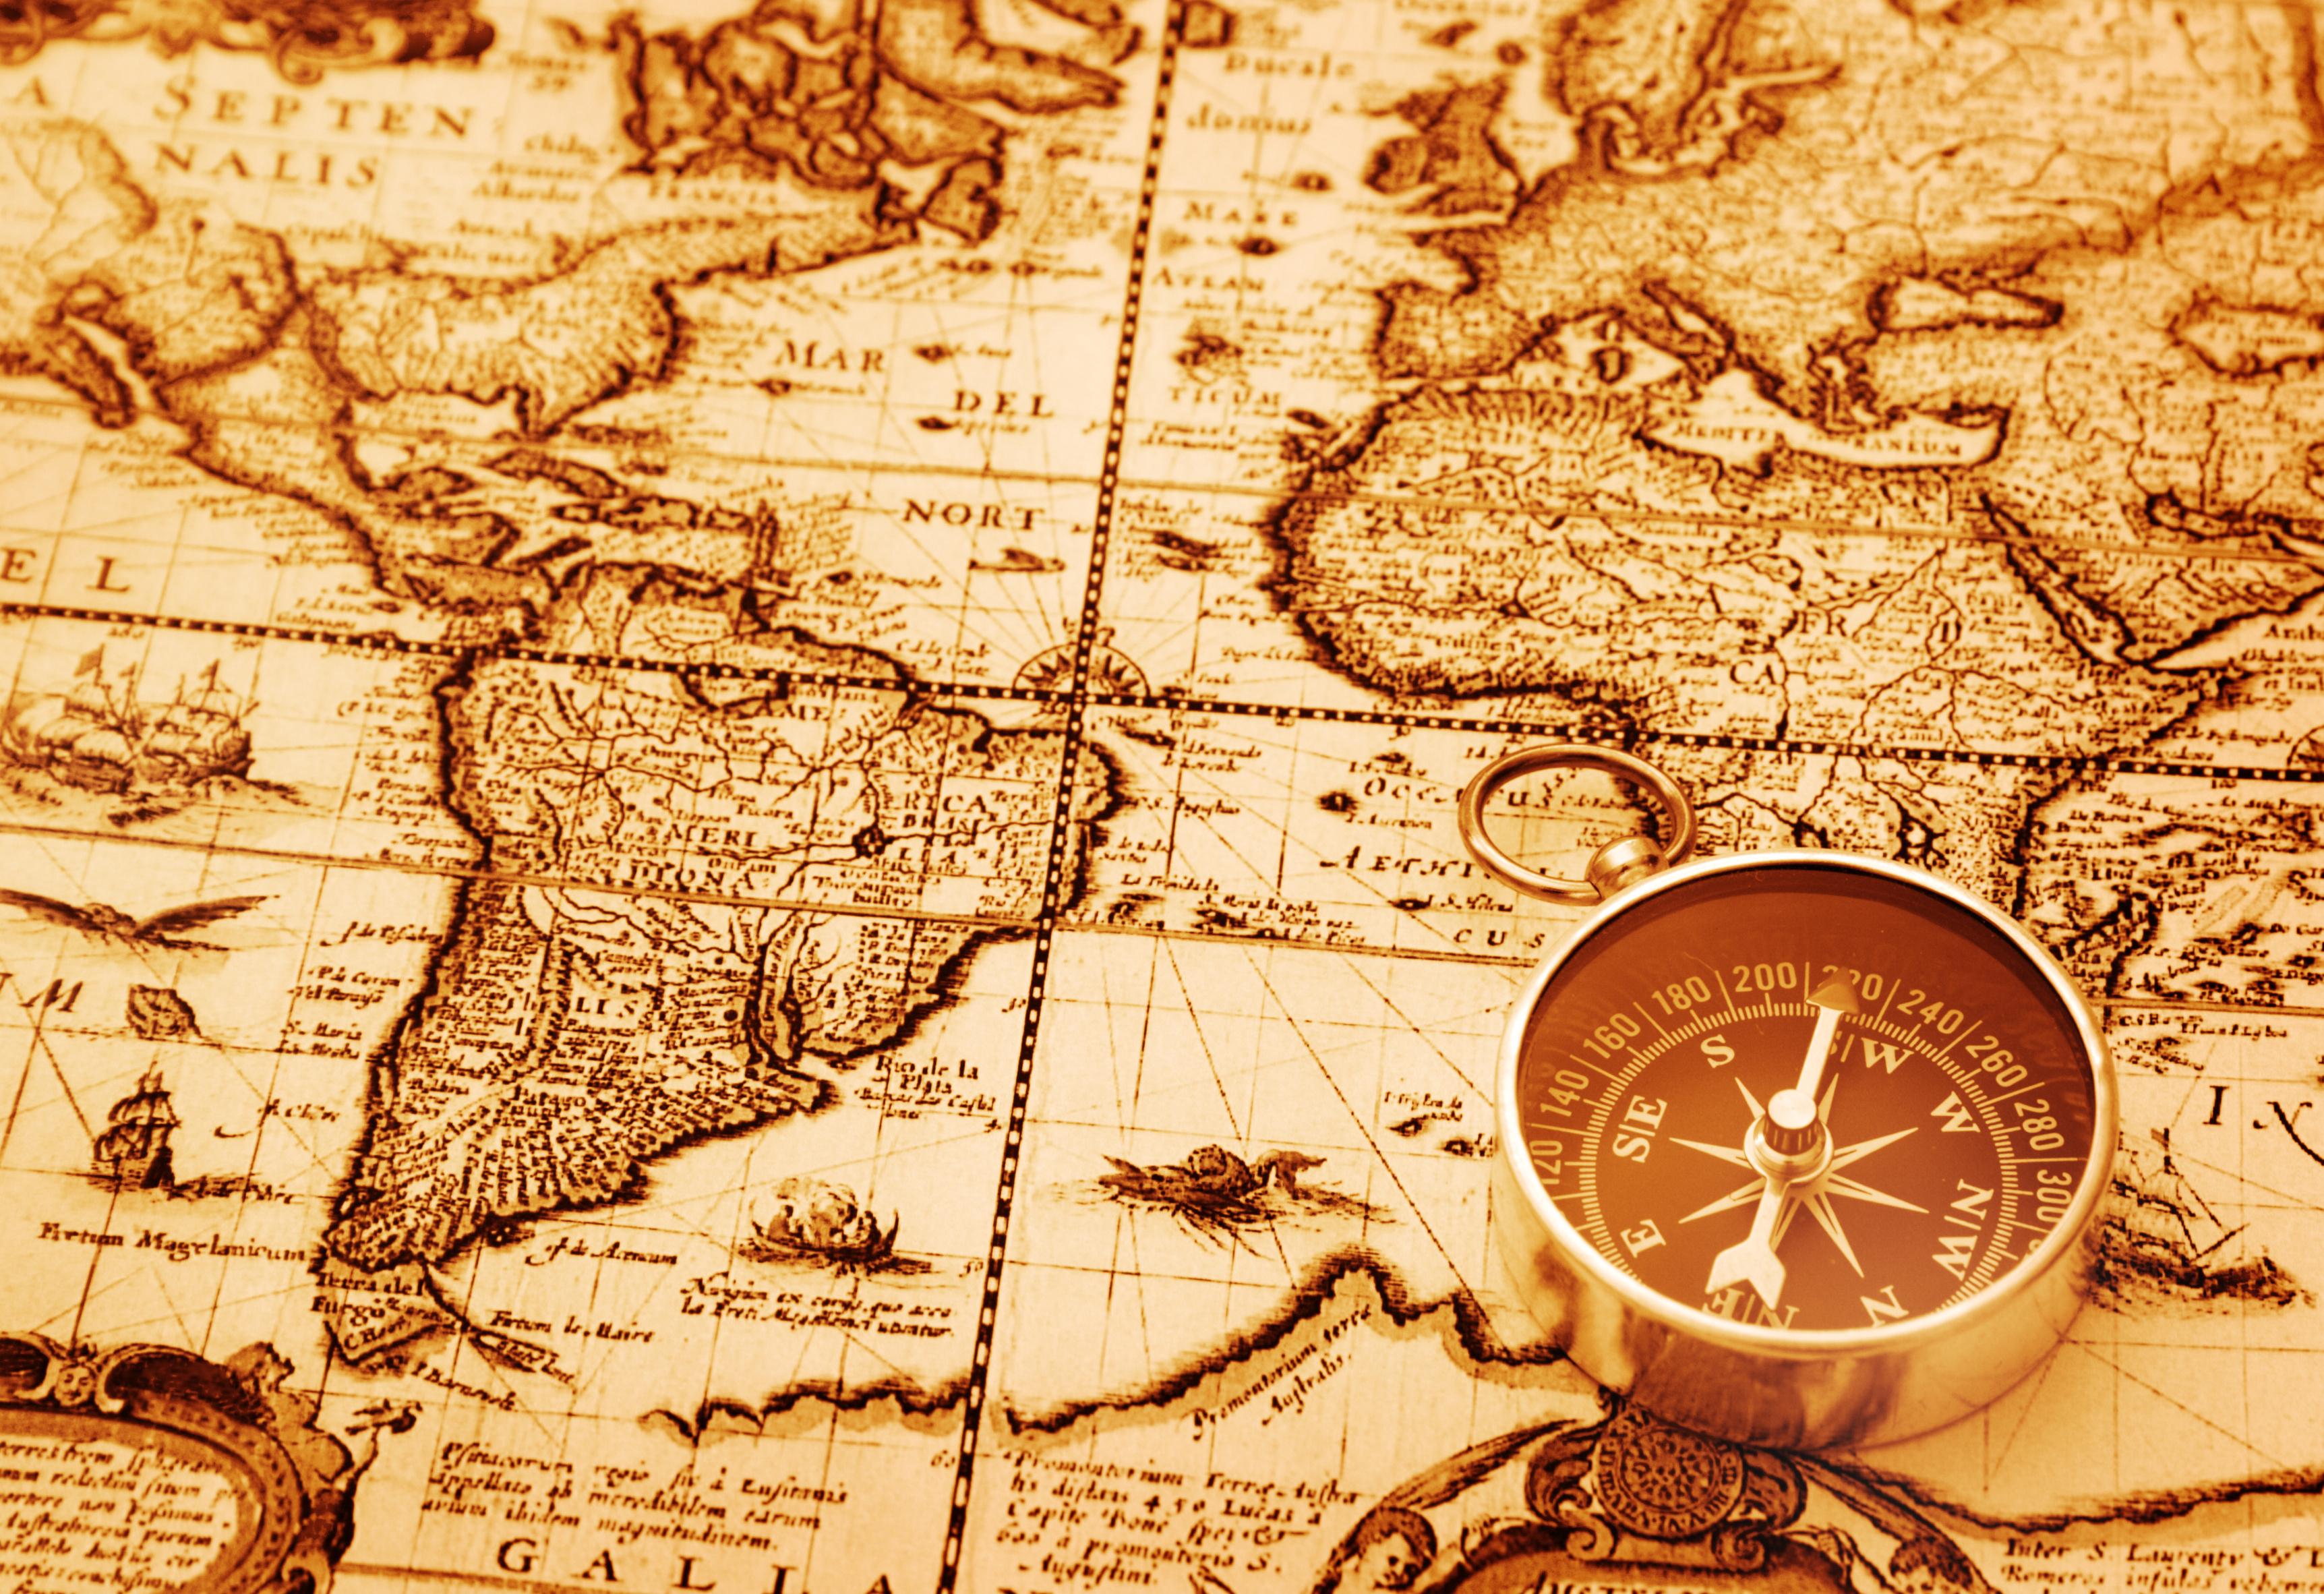 Wallpaper Maps Old World WallpaperSafari - Old us map and pics